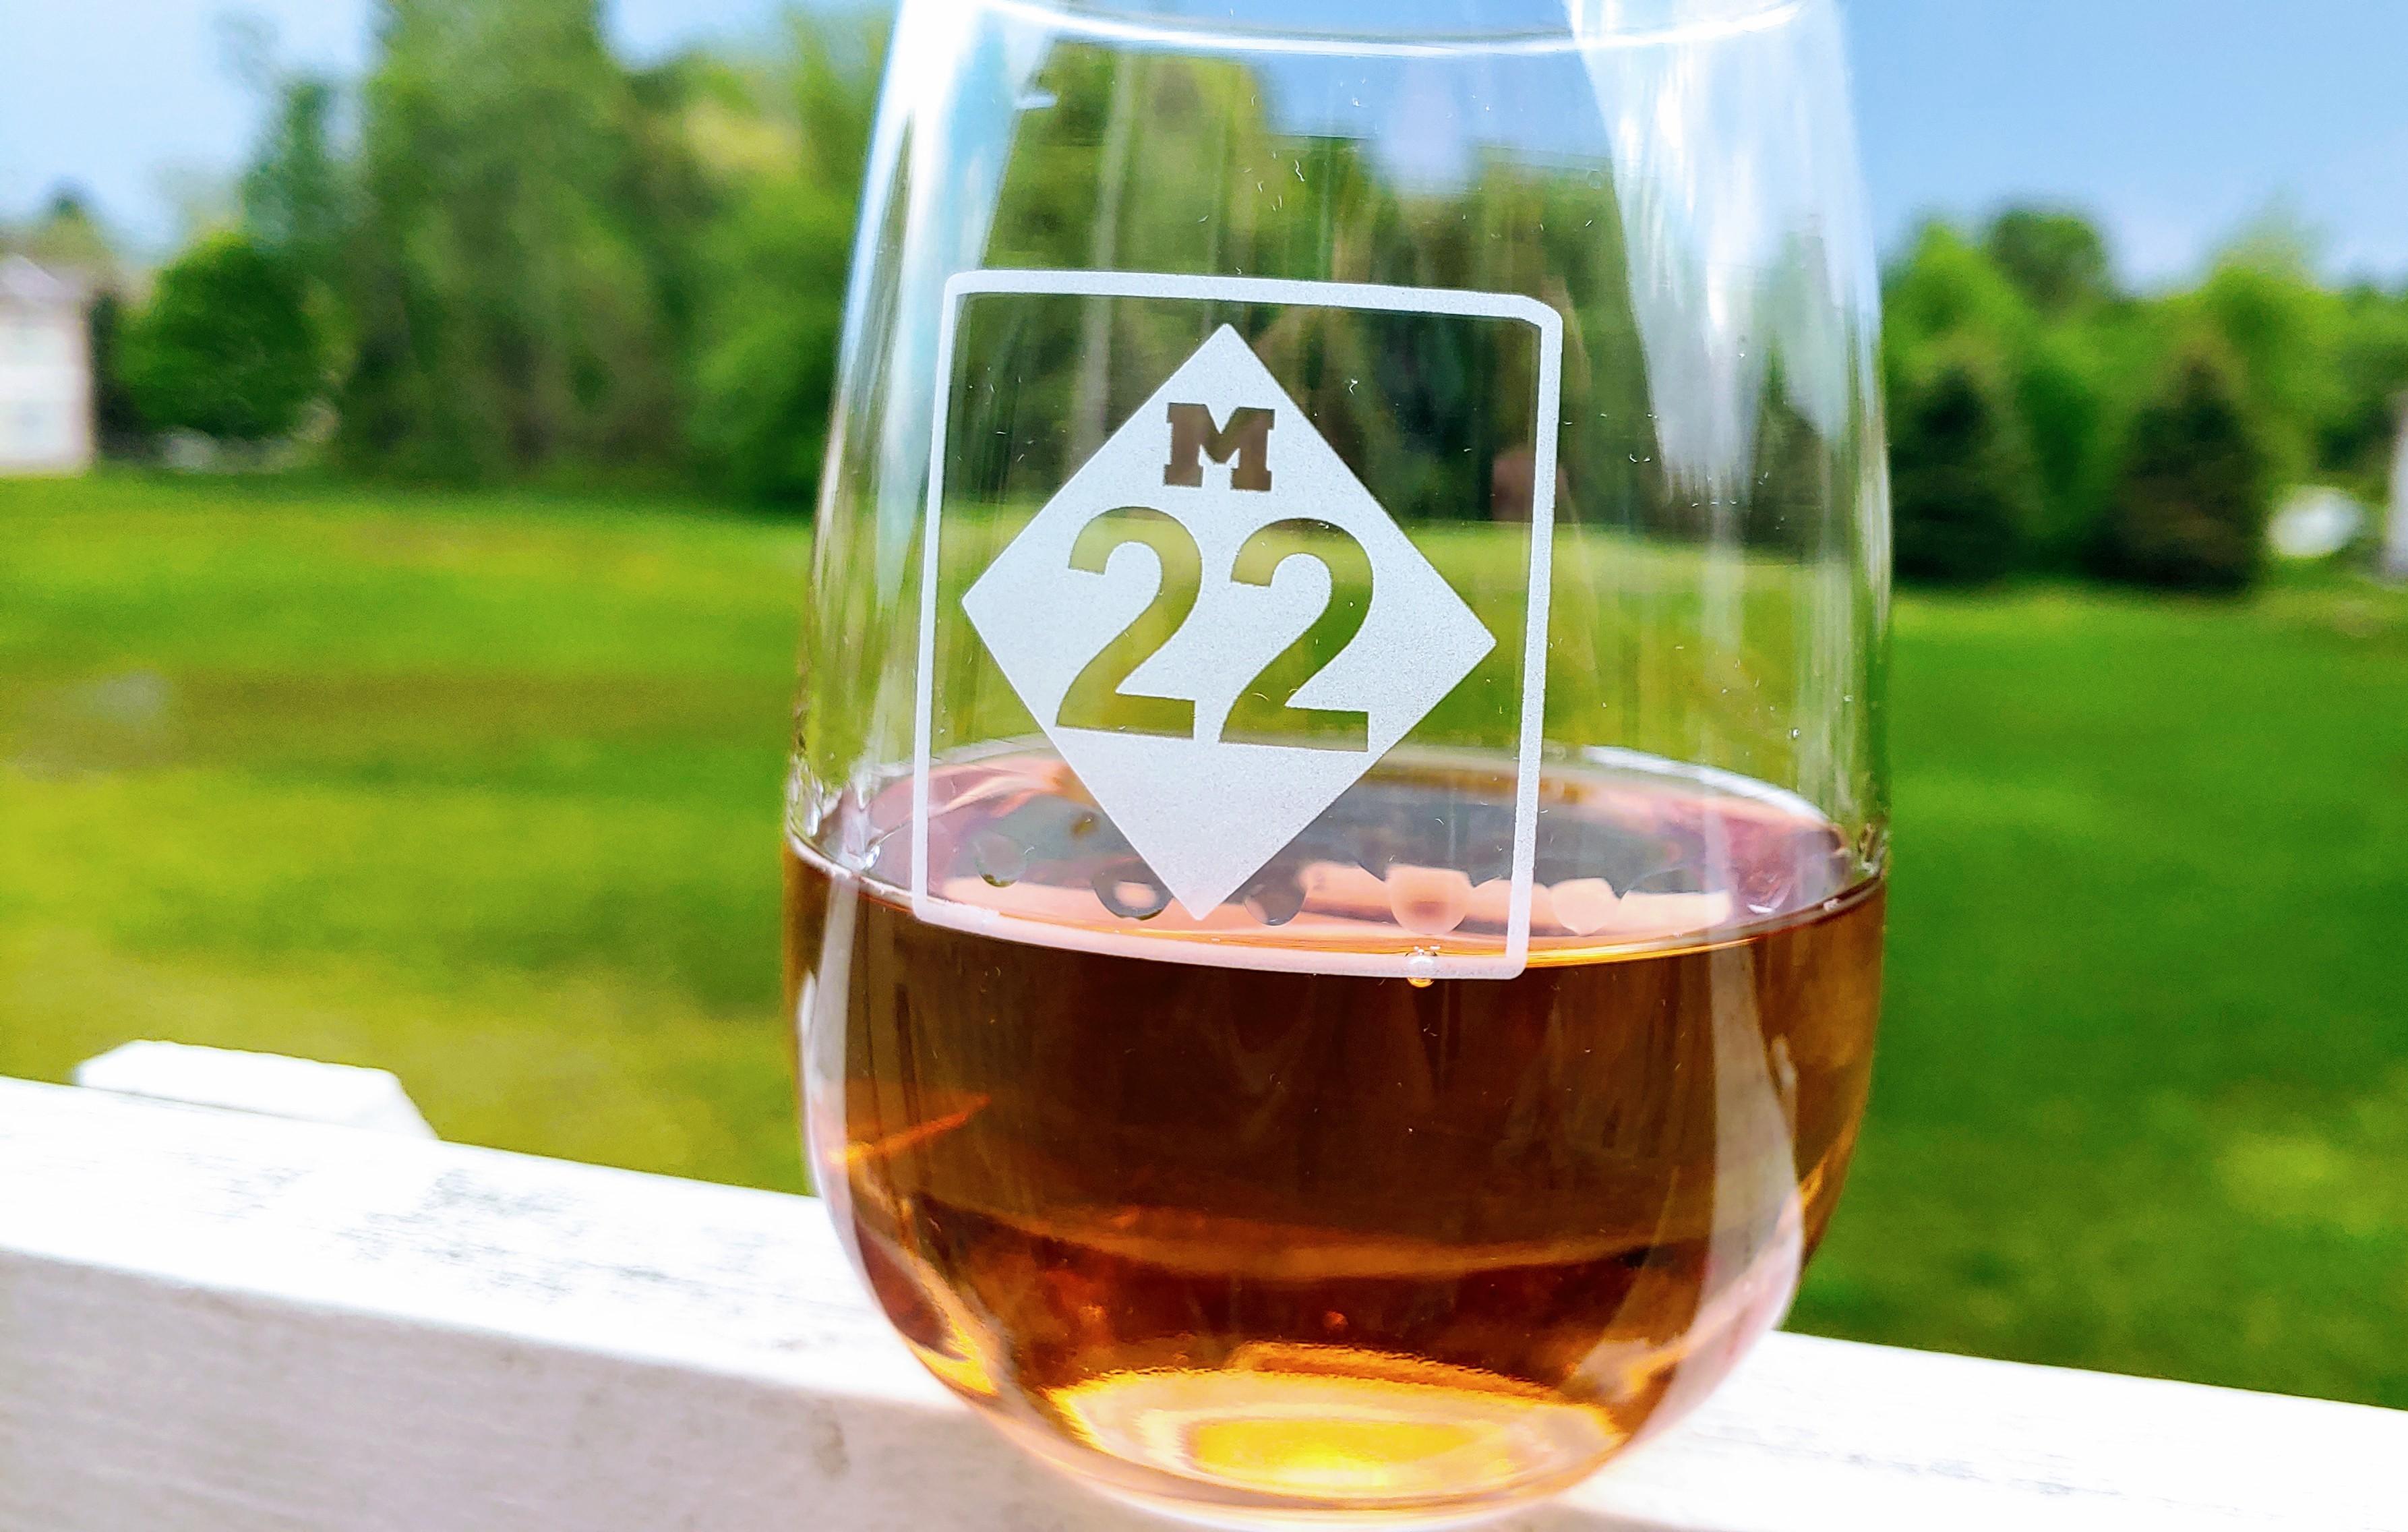 Best Wineries in Glen Arbor, next to Sleeping Bear Dunes National Lakeshore